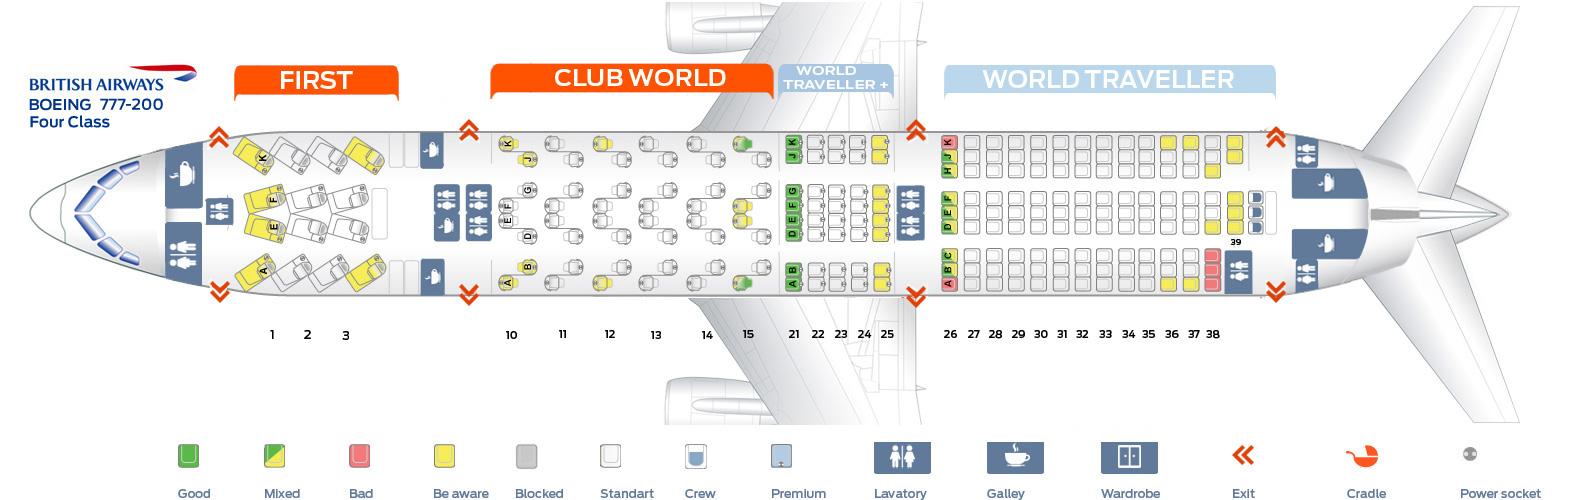 Boeing 777-200 Seat Map Seat map Boeing 777 200 British Airways. Best seats in plane Boeing 777-200 Seat Map